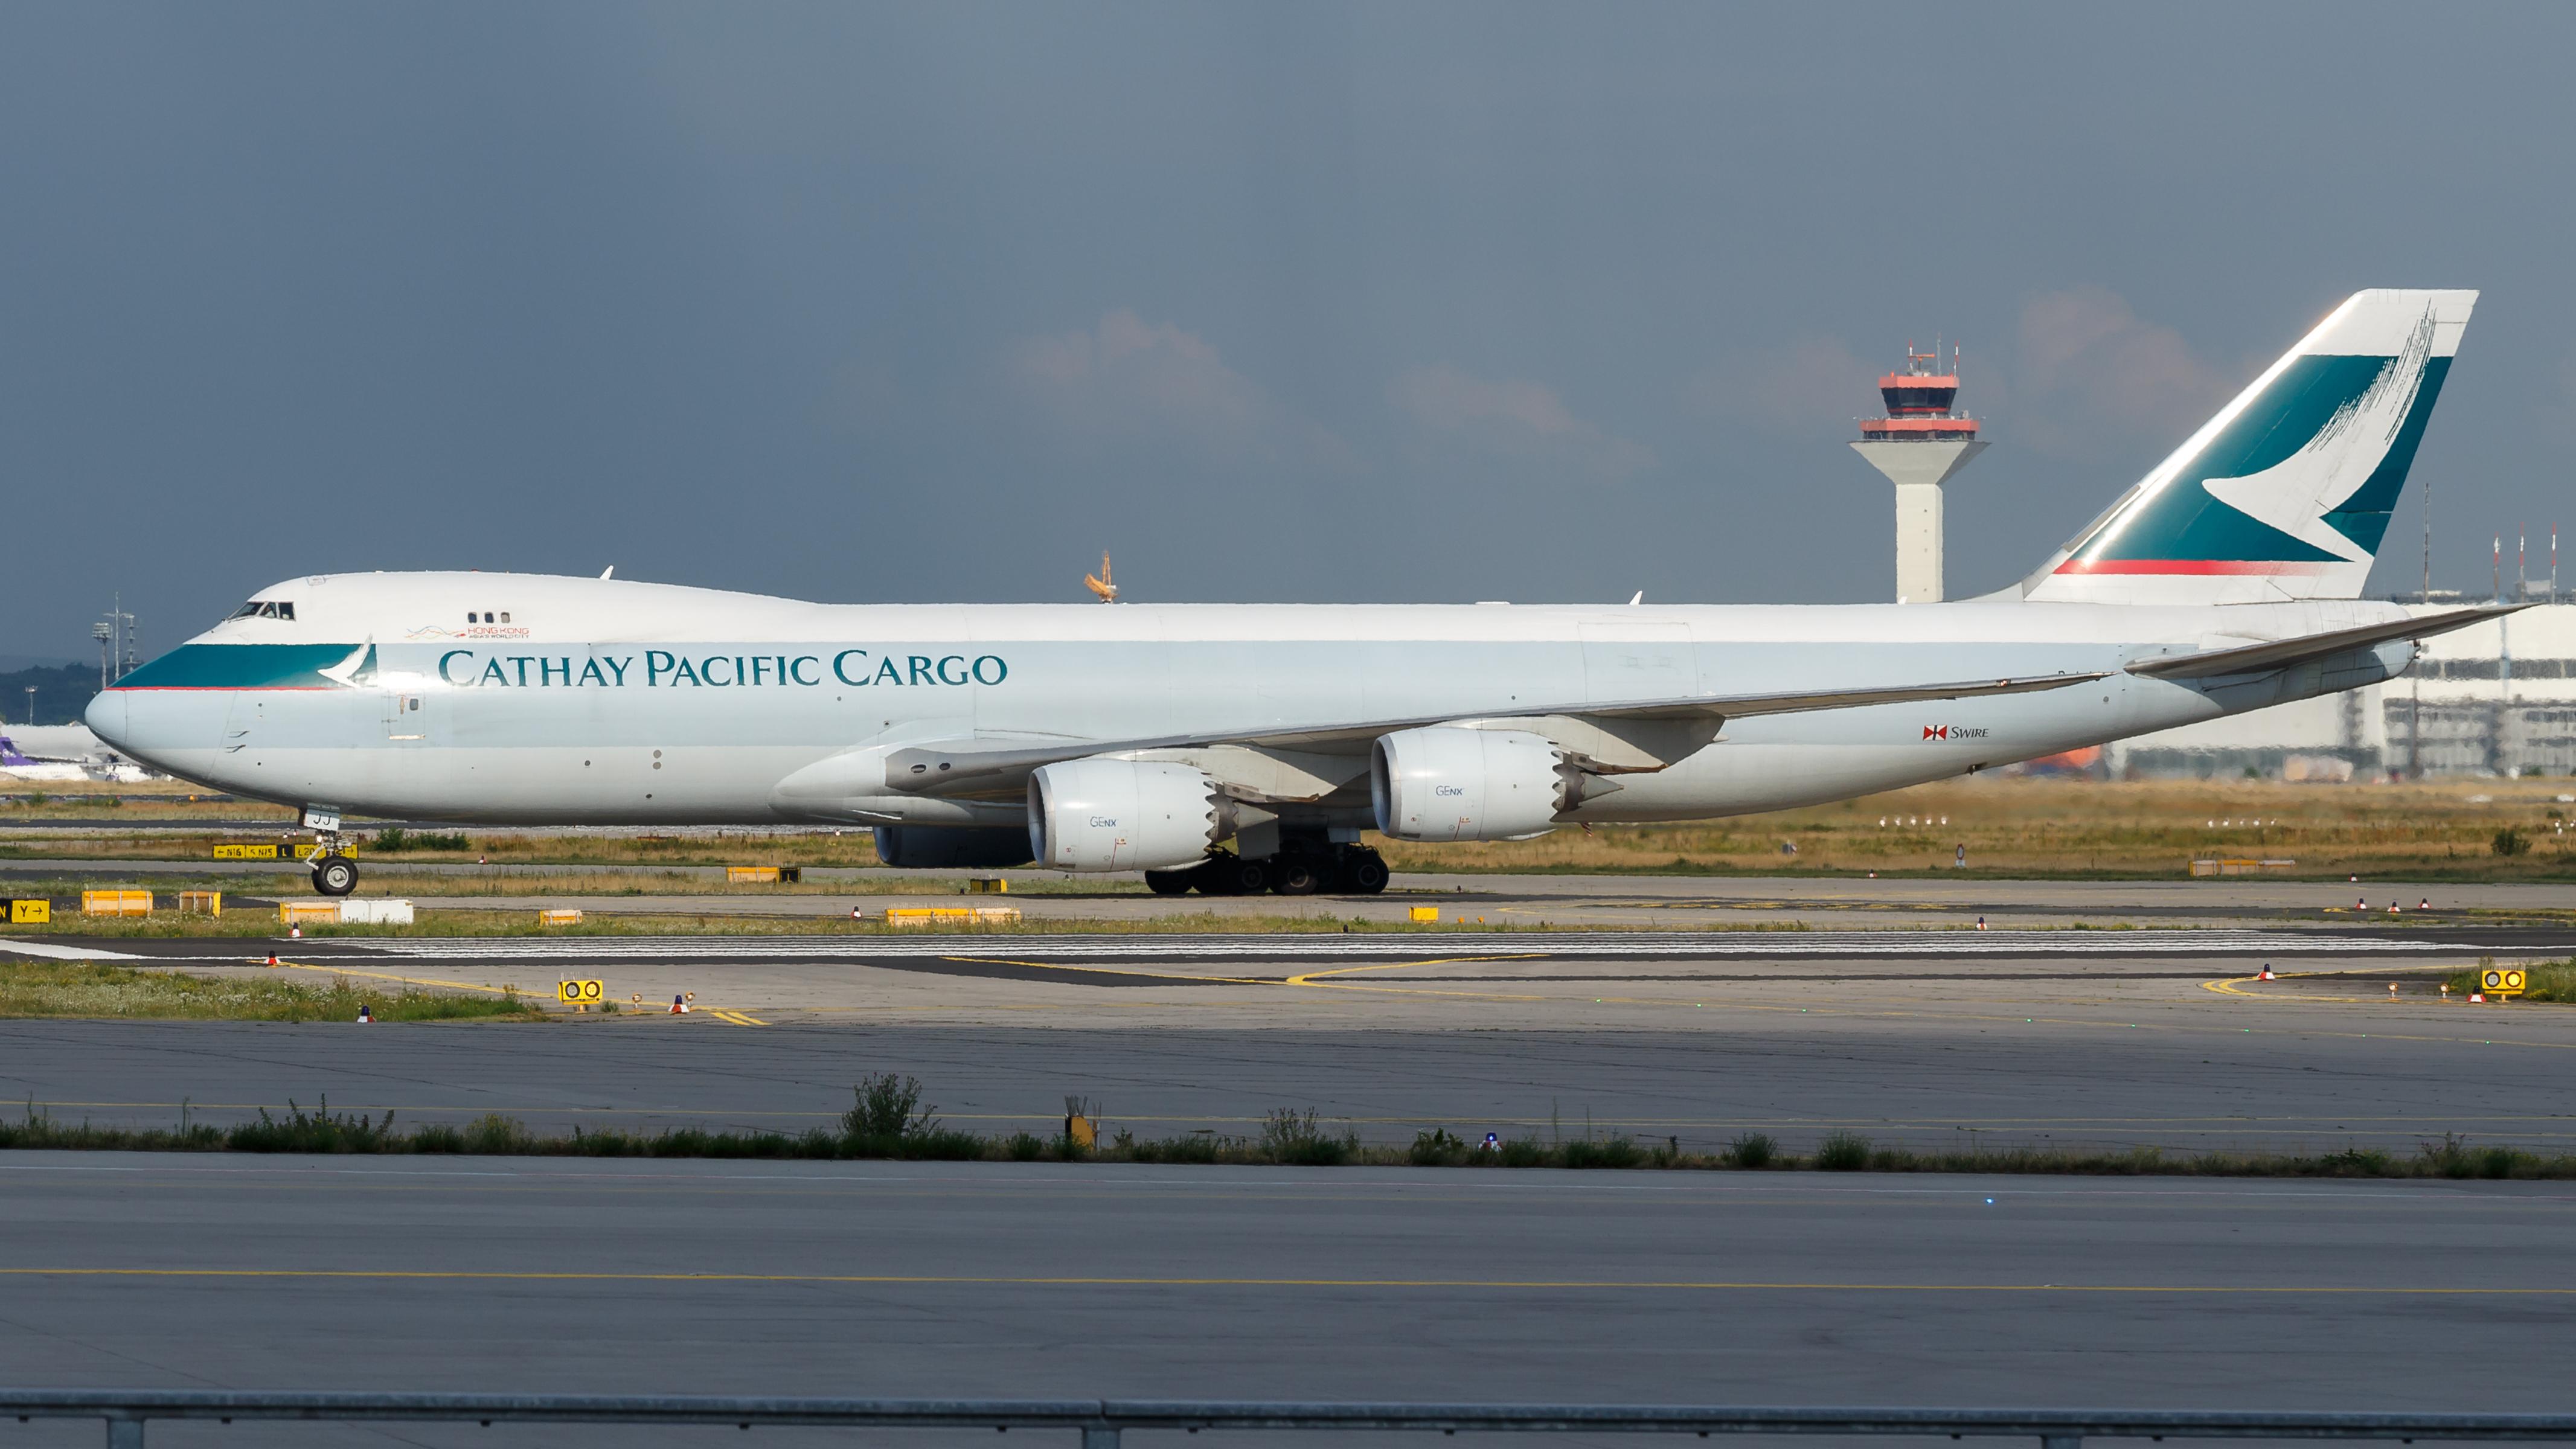 File:Cathay Pacific Cargo Boeing 747-8F (B-LJJ) at Frankfurt